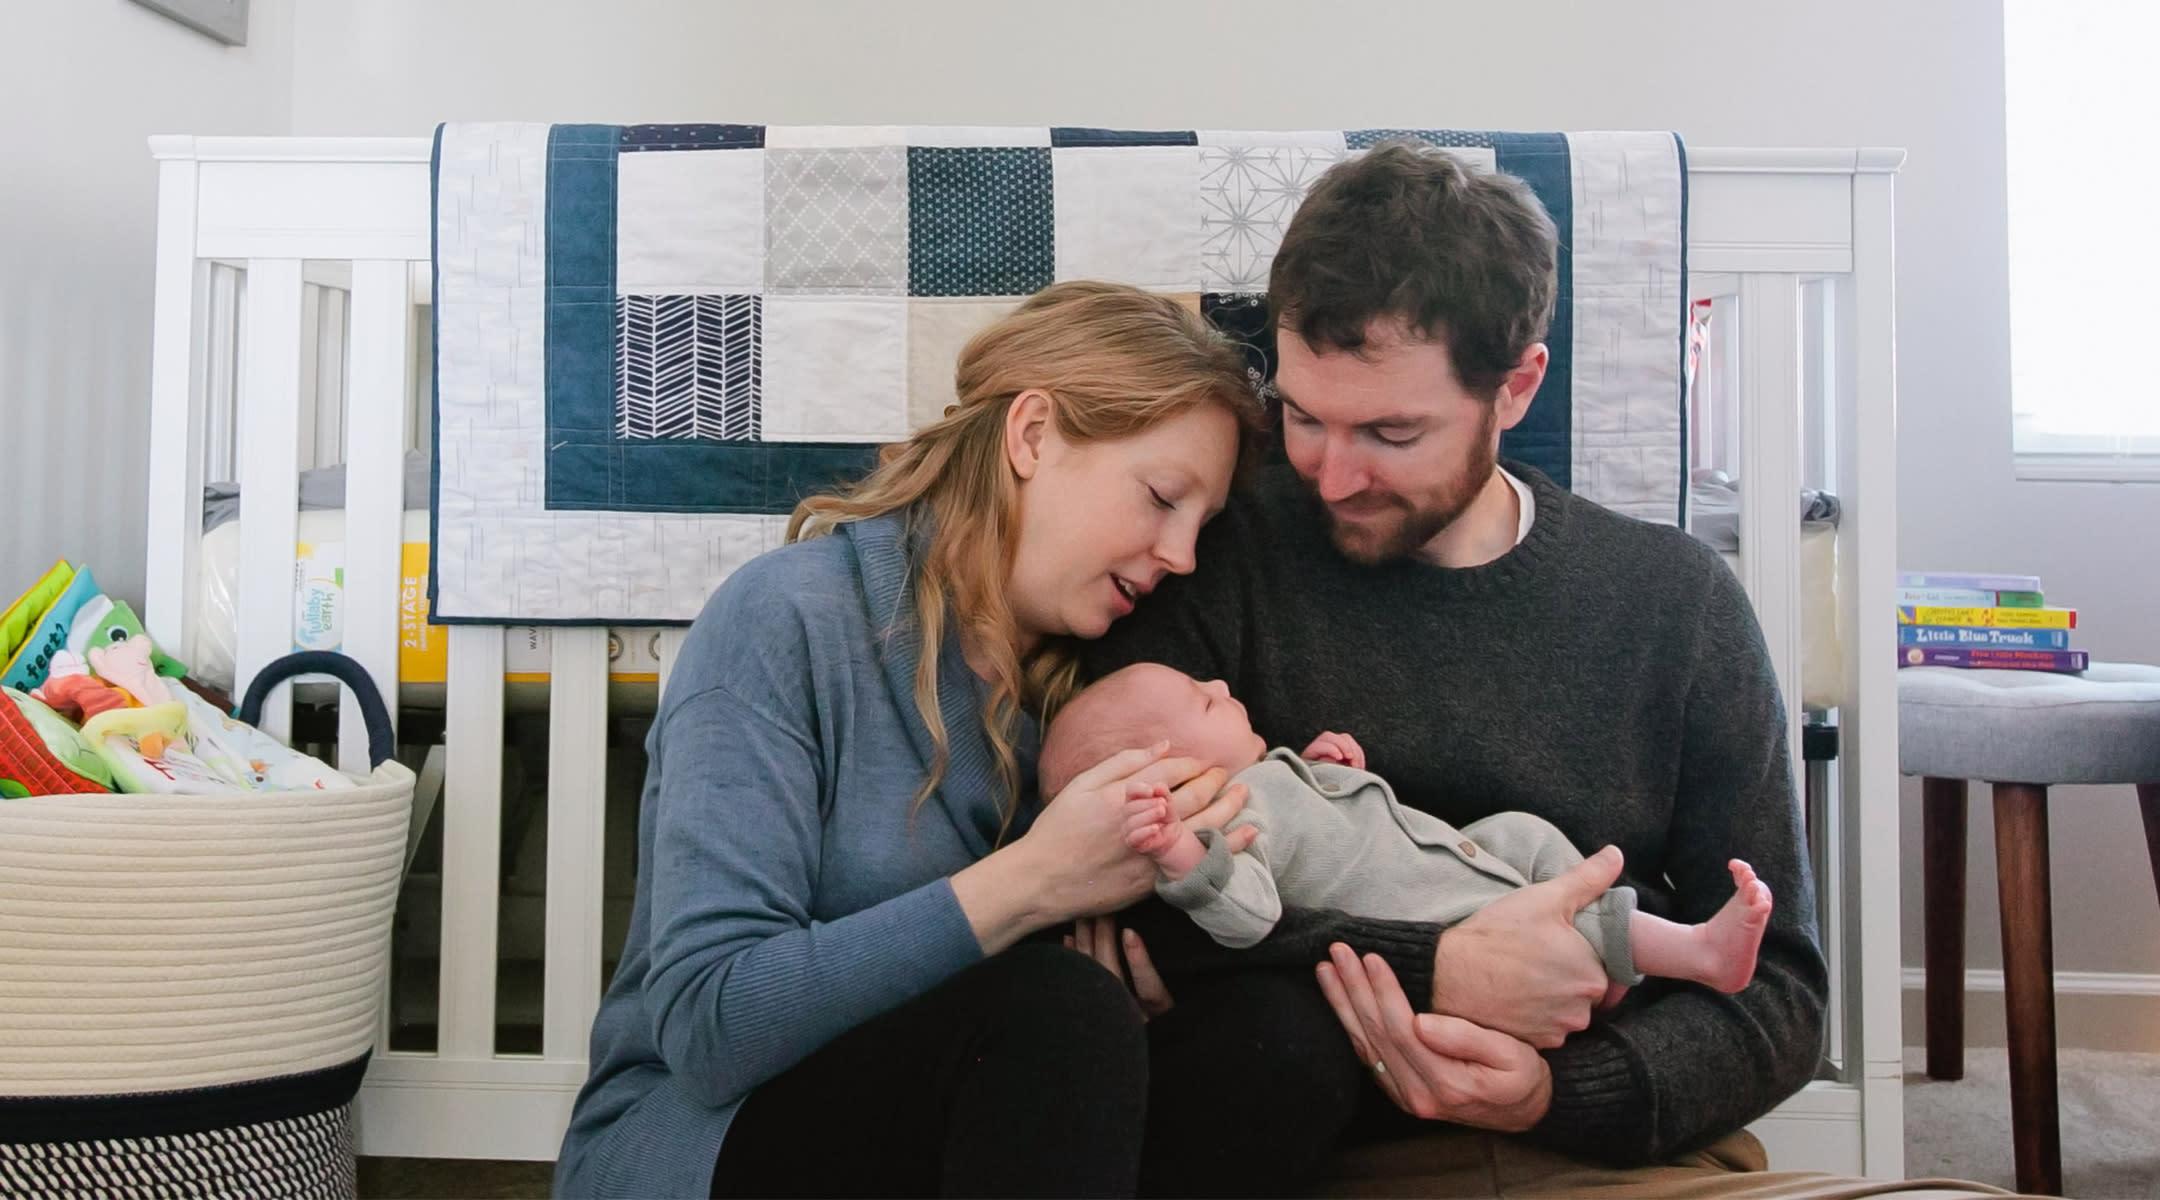 parents stare at newborn baby in their nursery